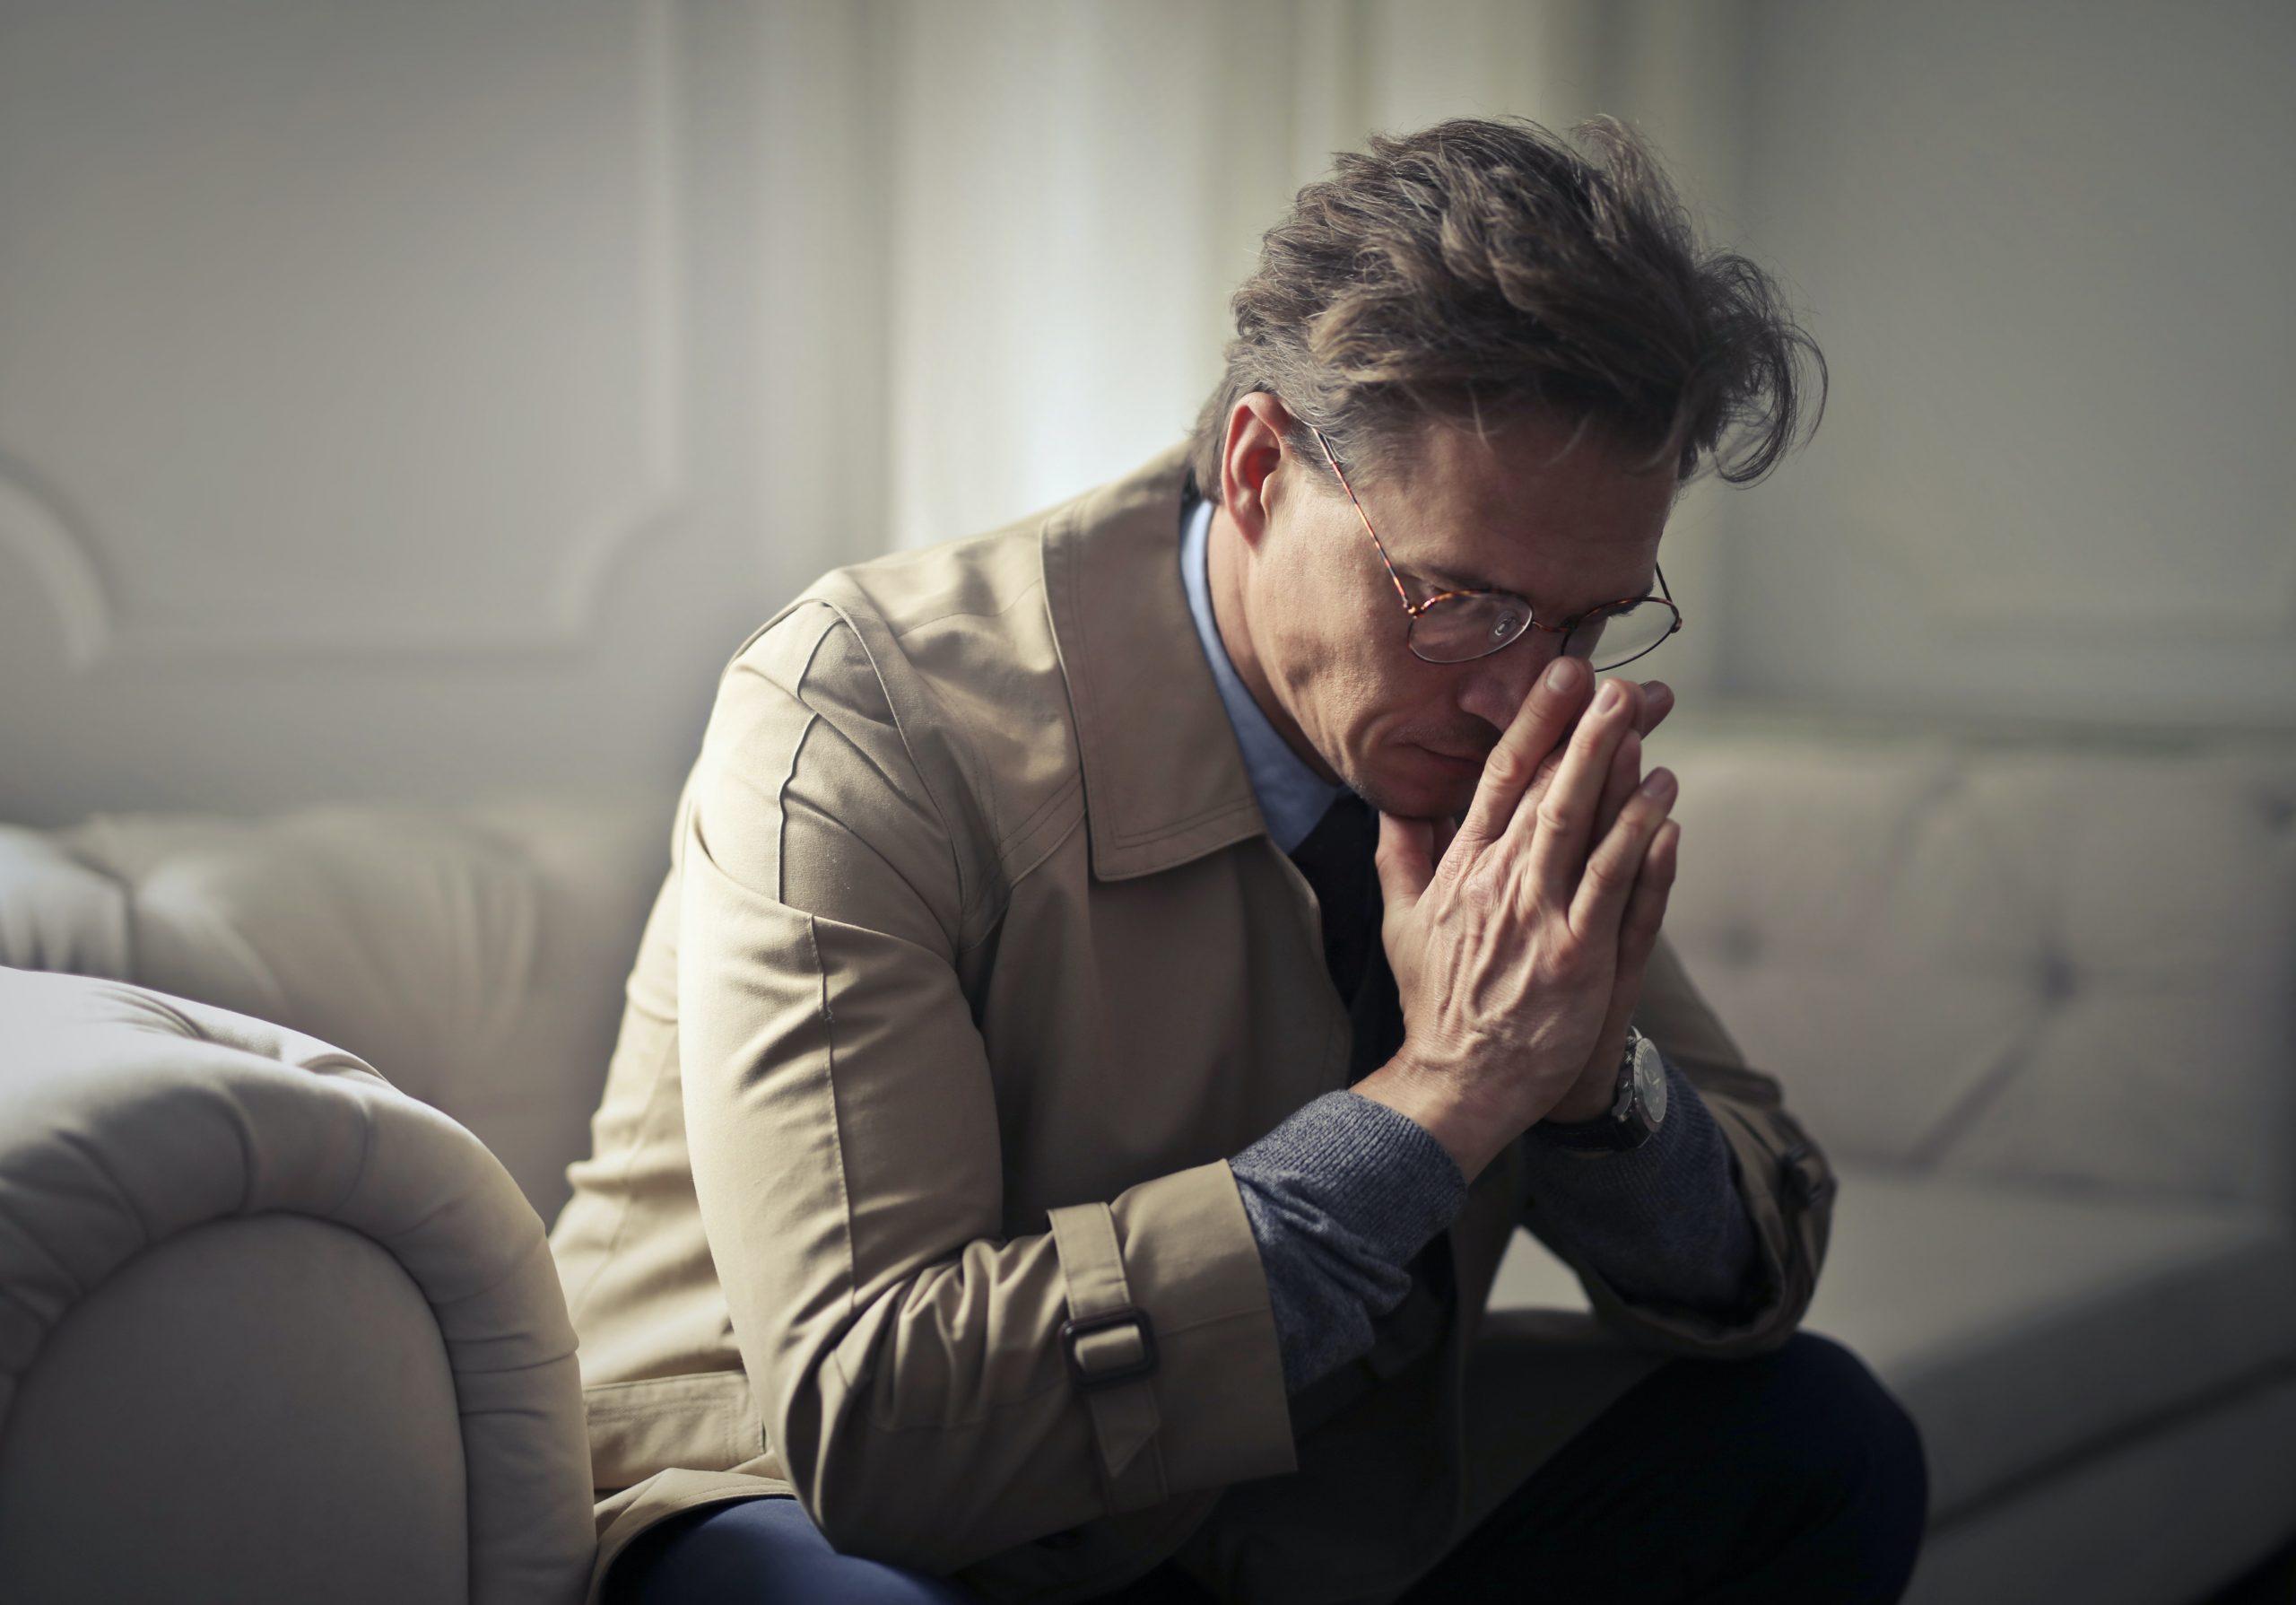 How to Break Through Difficult Cases of Depression